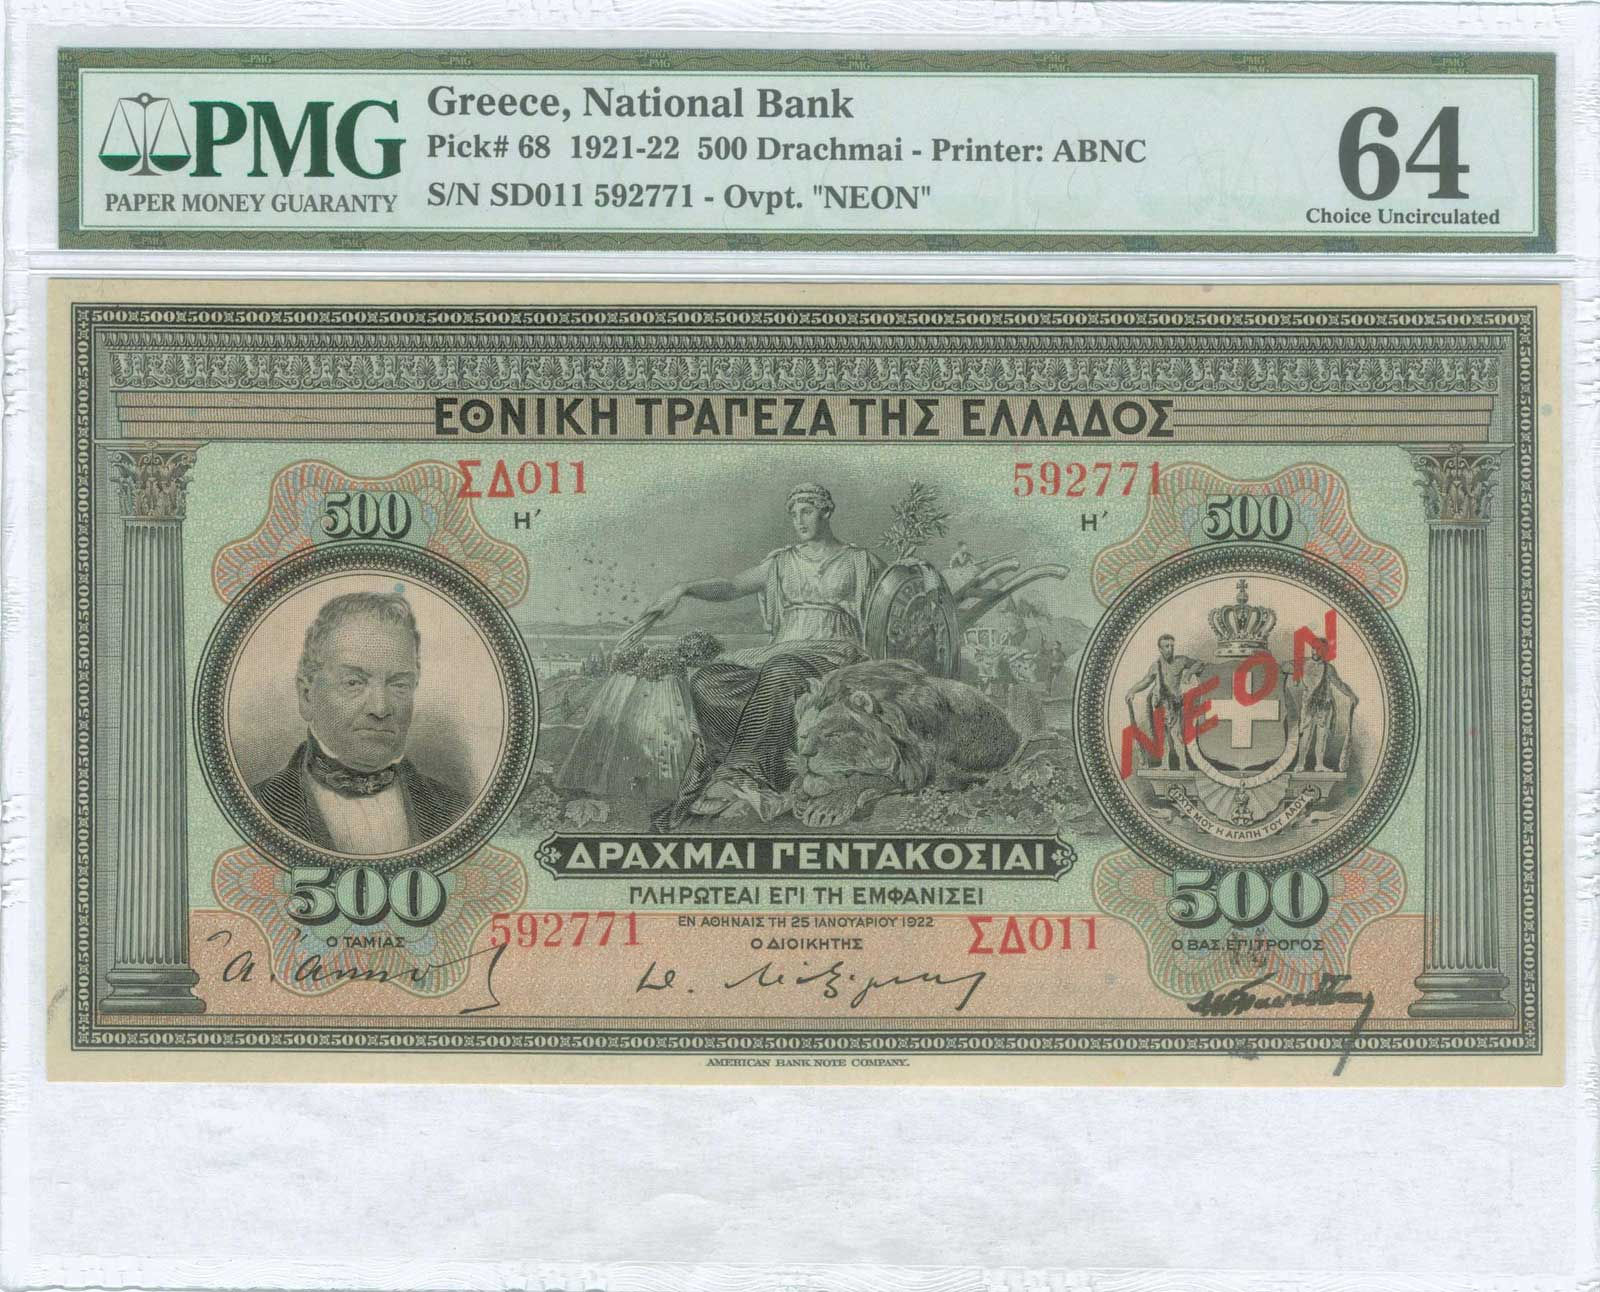 Lot 9271 - GREECE-  PAPER MONEY - BANKNOTES National Bank of Greece -  A. Karamitsos Public & LIVE Bid Auction 610 Coins, Medals & Banknotes